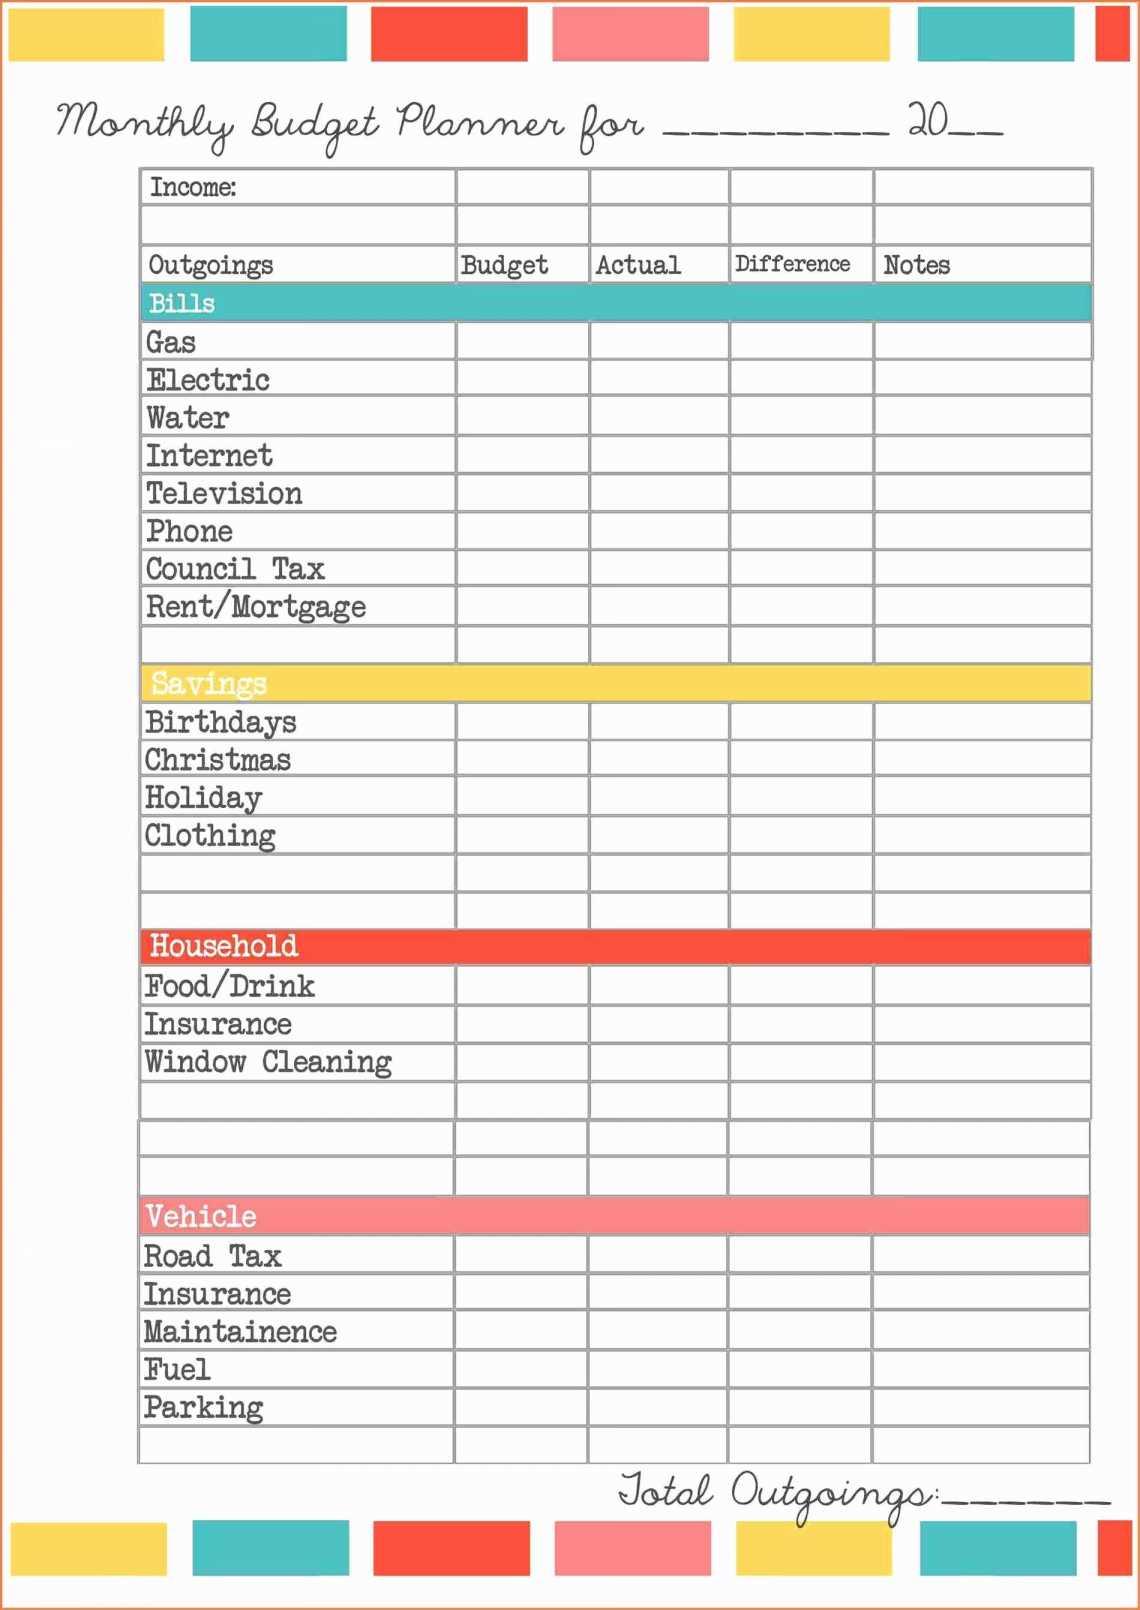 Church Accounting Spreadsheet Templates 50 Fresh Free Church With Free Church Accounting Spreadsheets